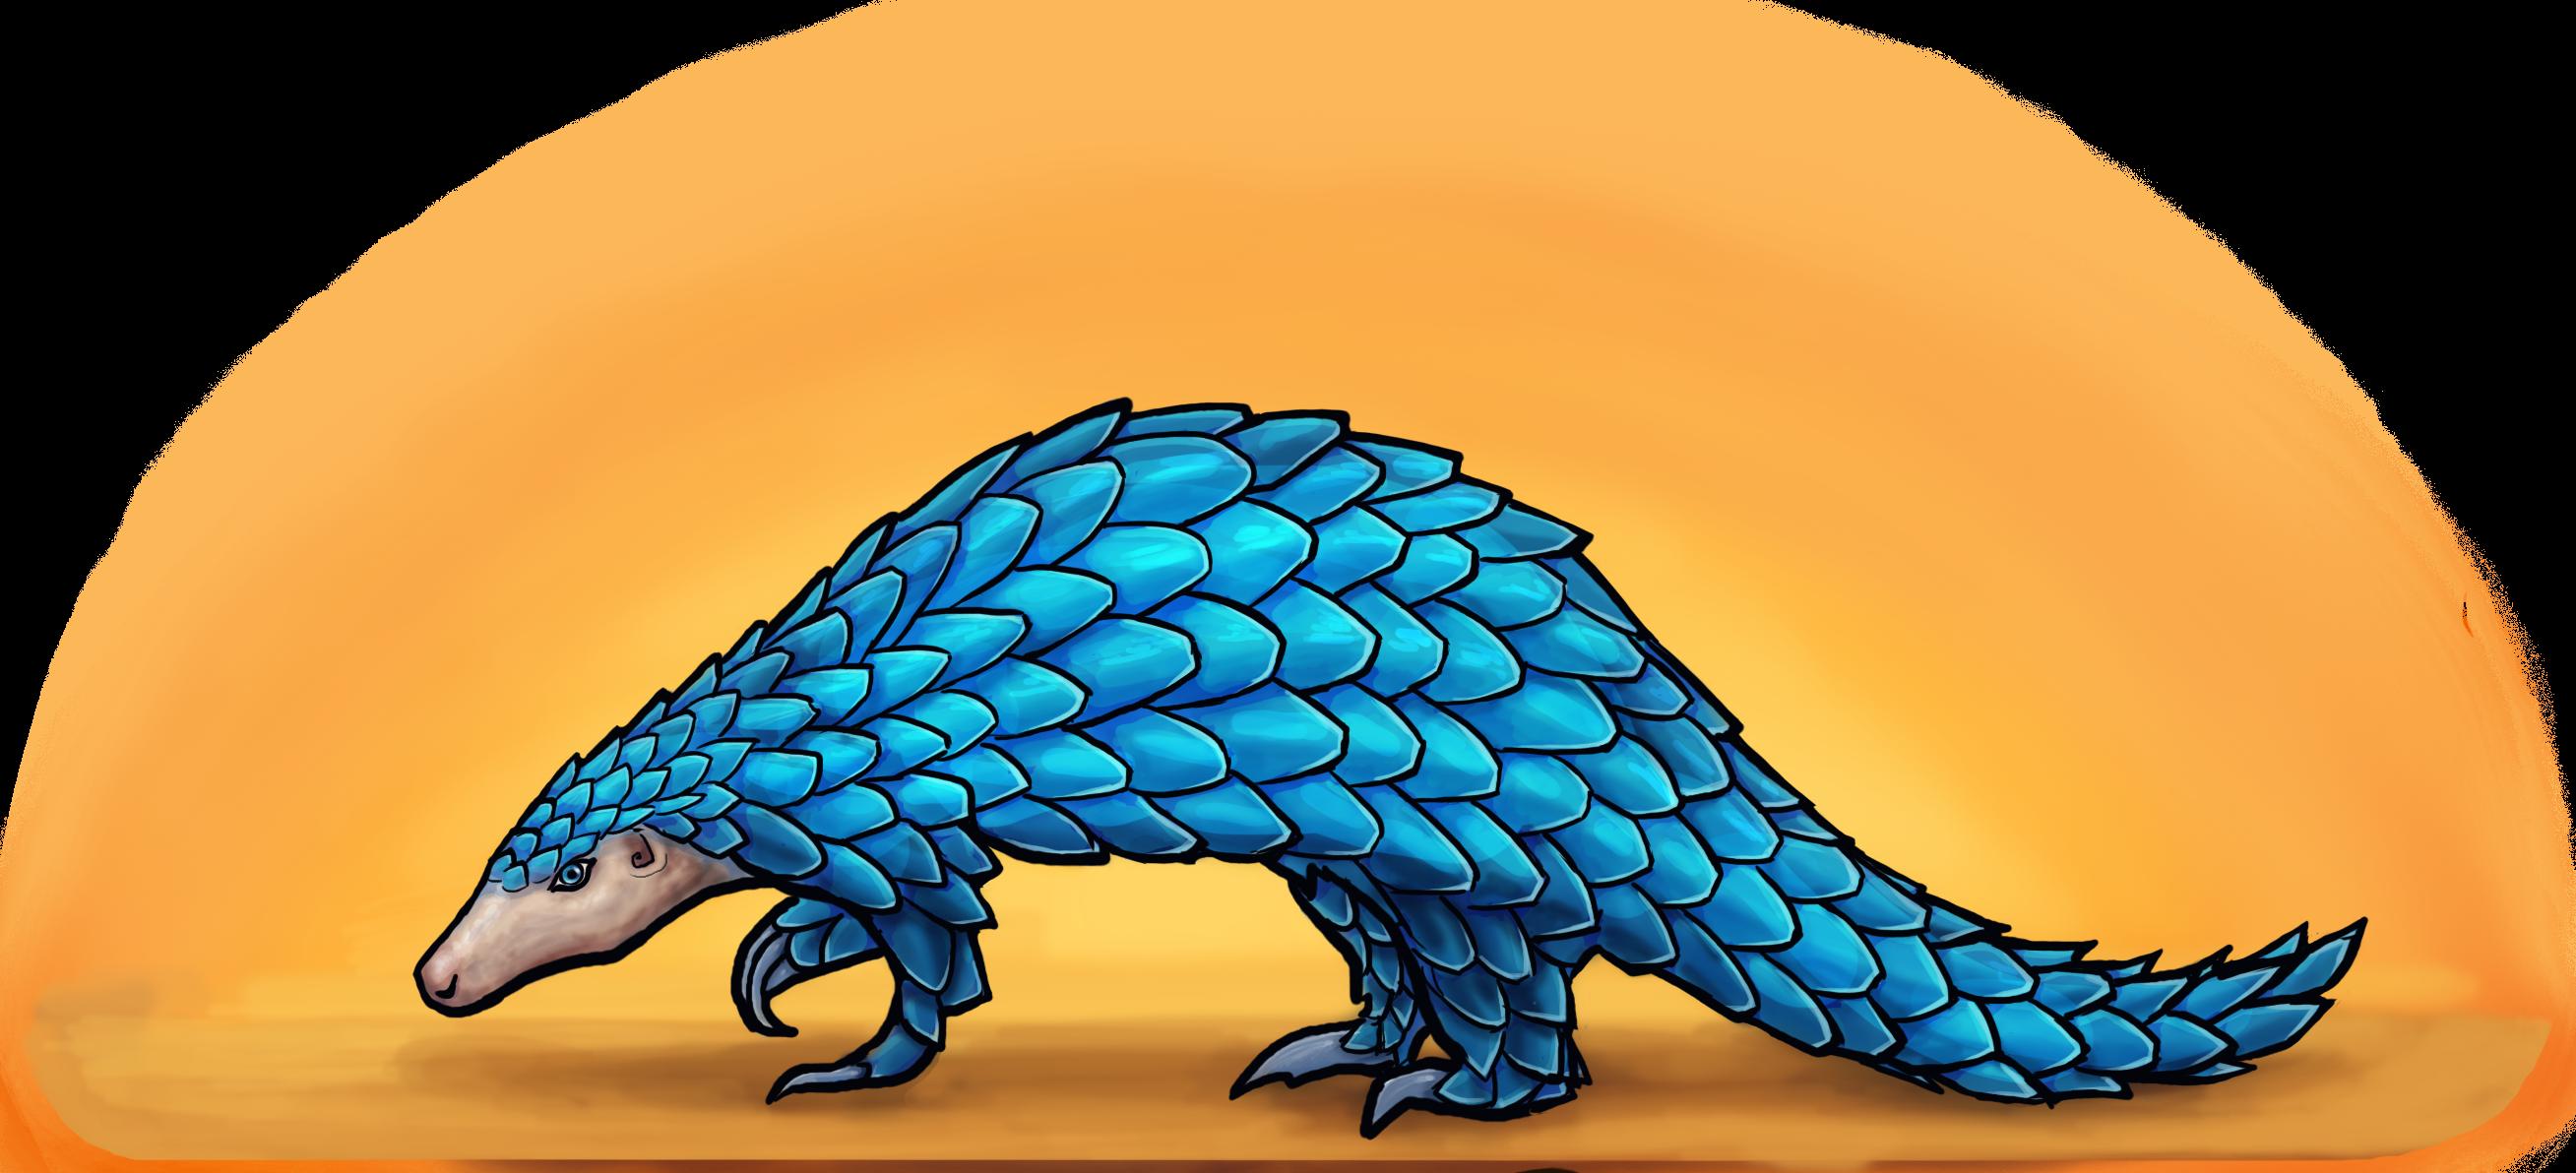 The Blue Pangolin